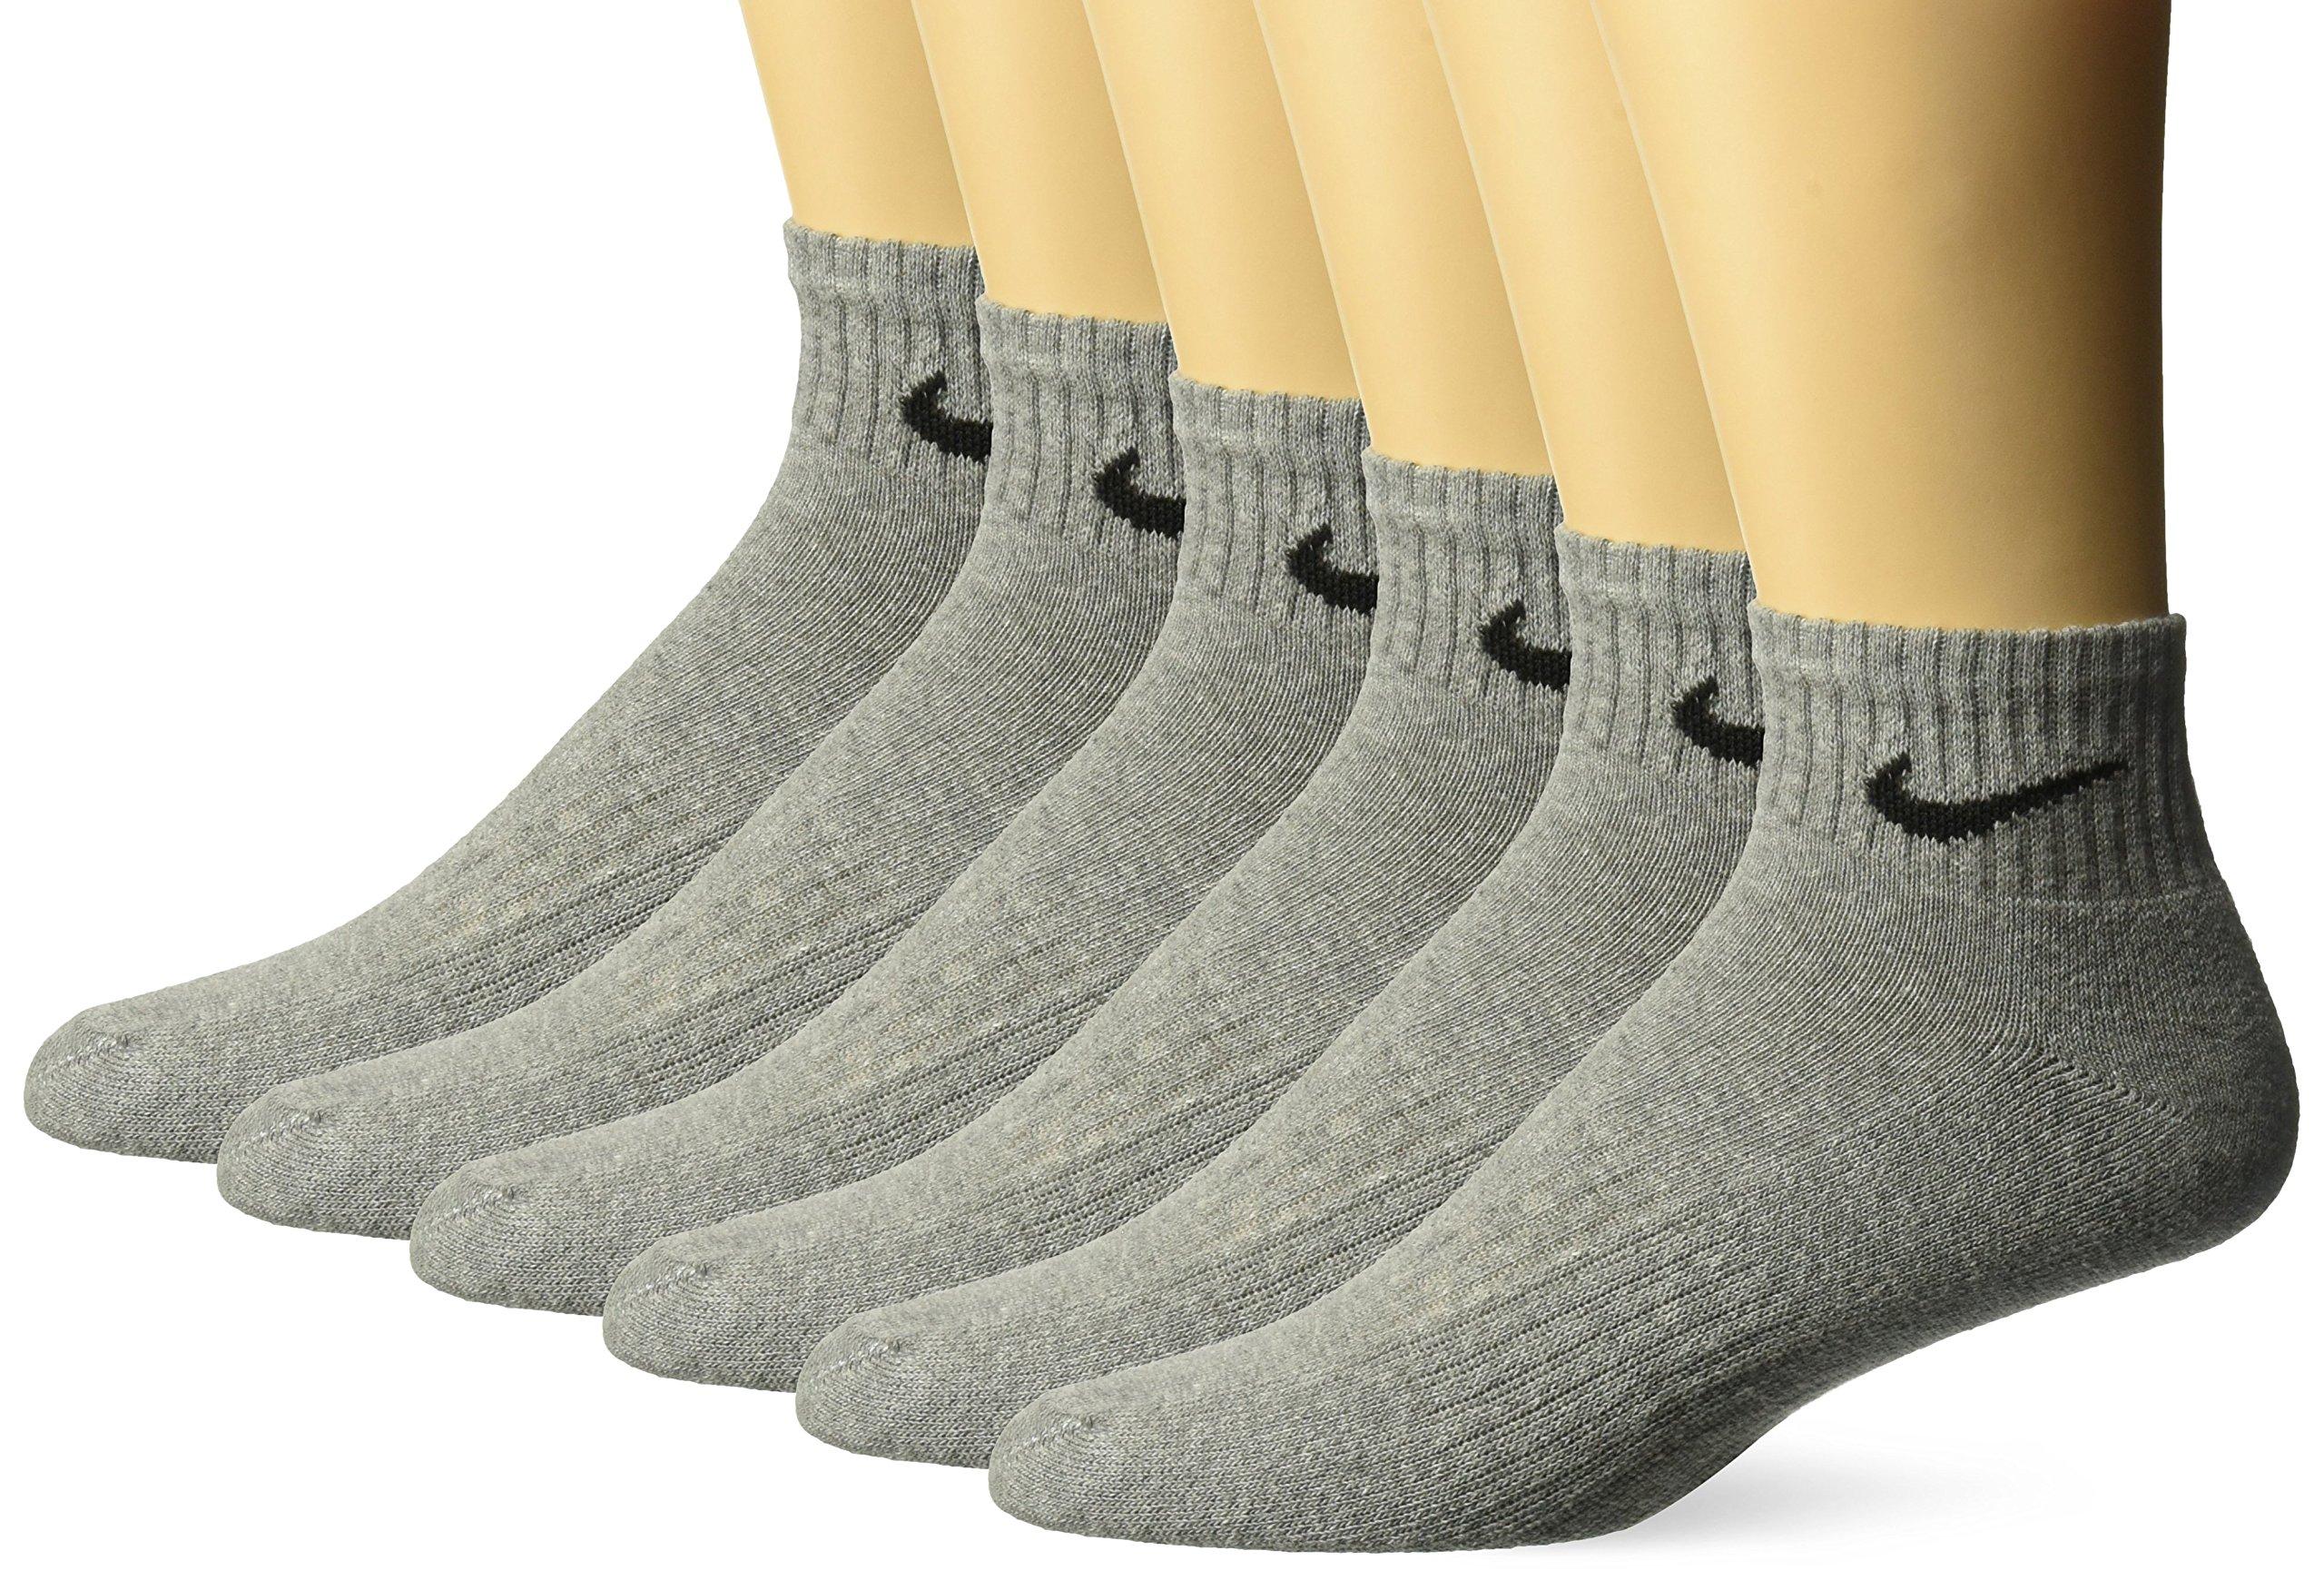 NIKE Unisex Performance Cushion Quarter Socks with Bag (6 Pairs), Dark Grey Heather/Black, Medium